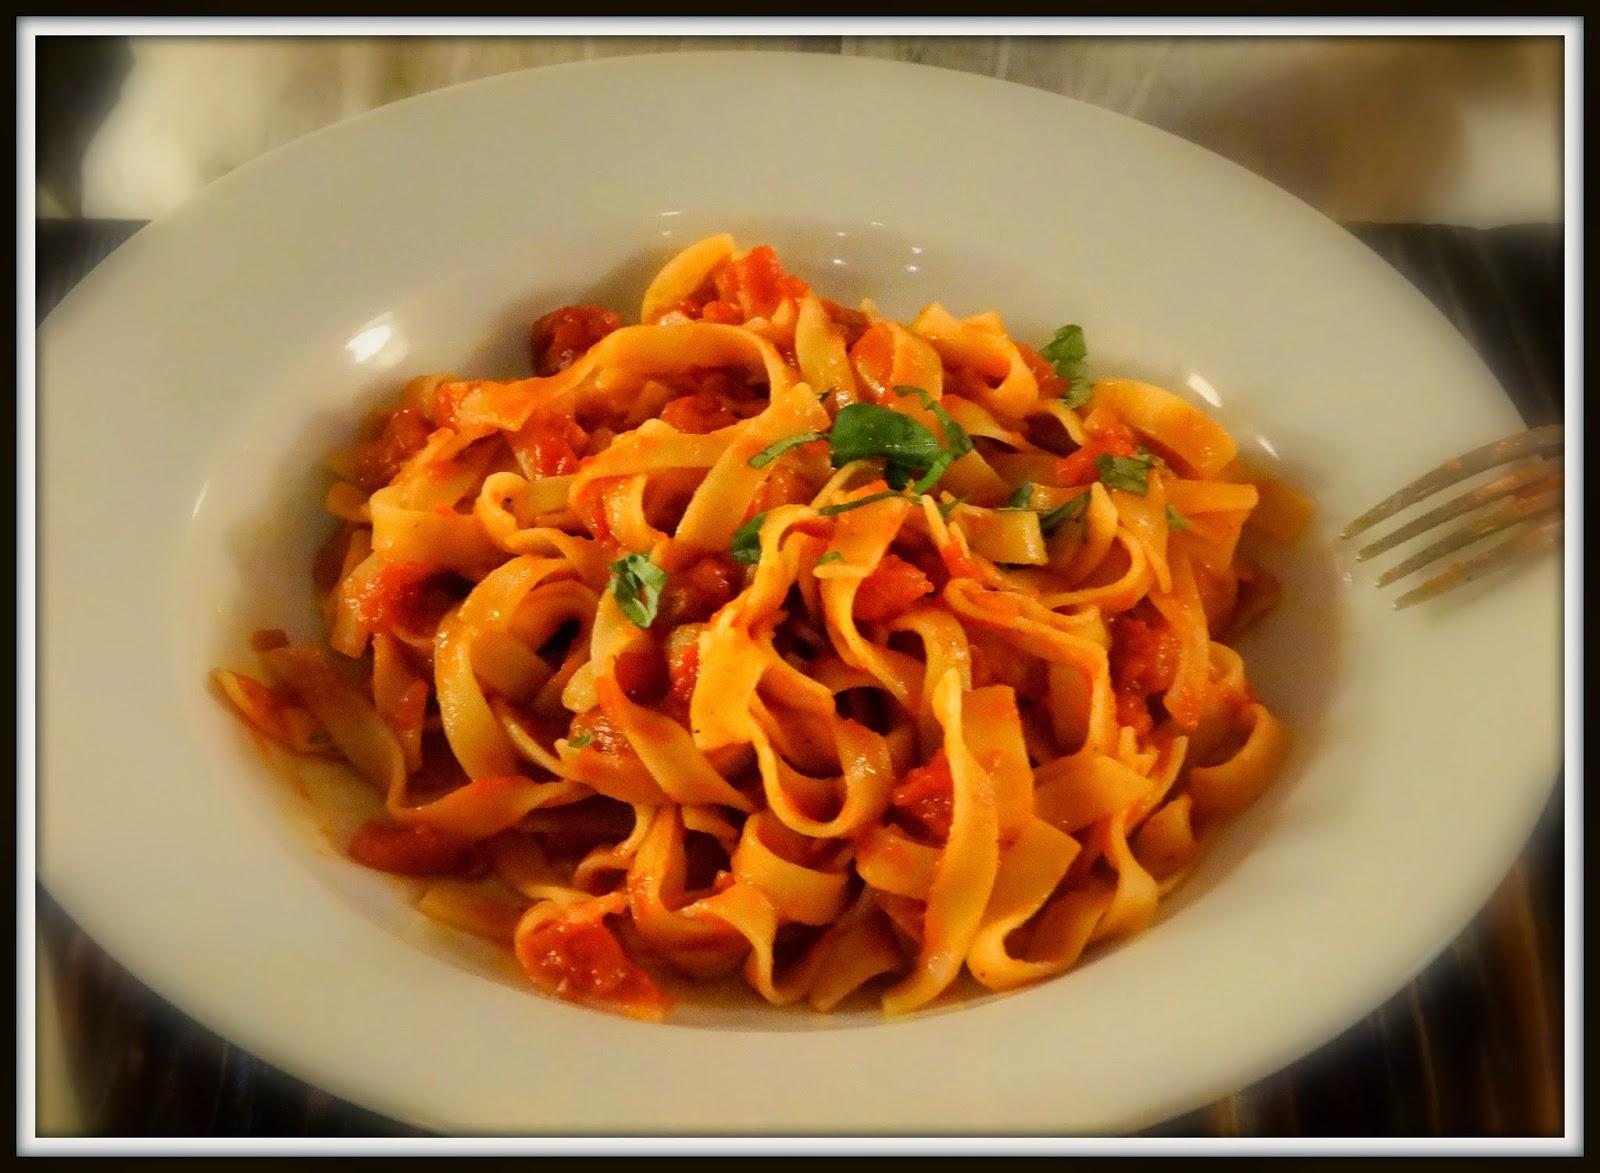 Fabryka Pizzy, pasta, spaghetti